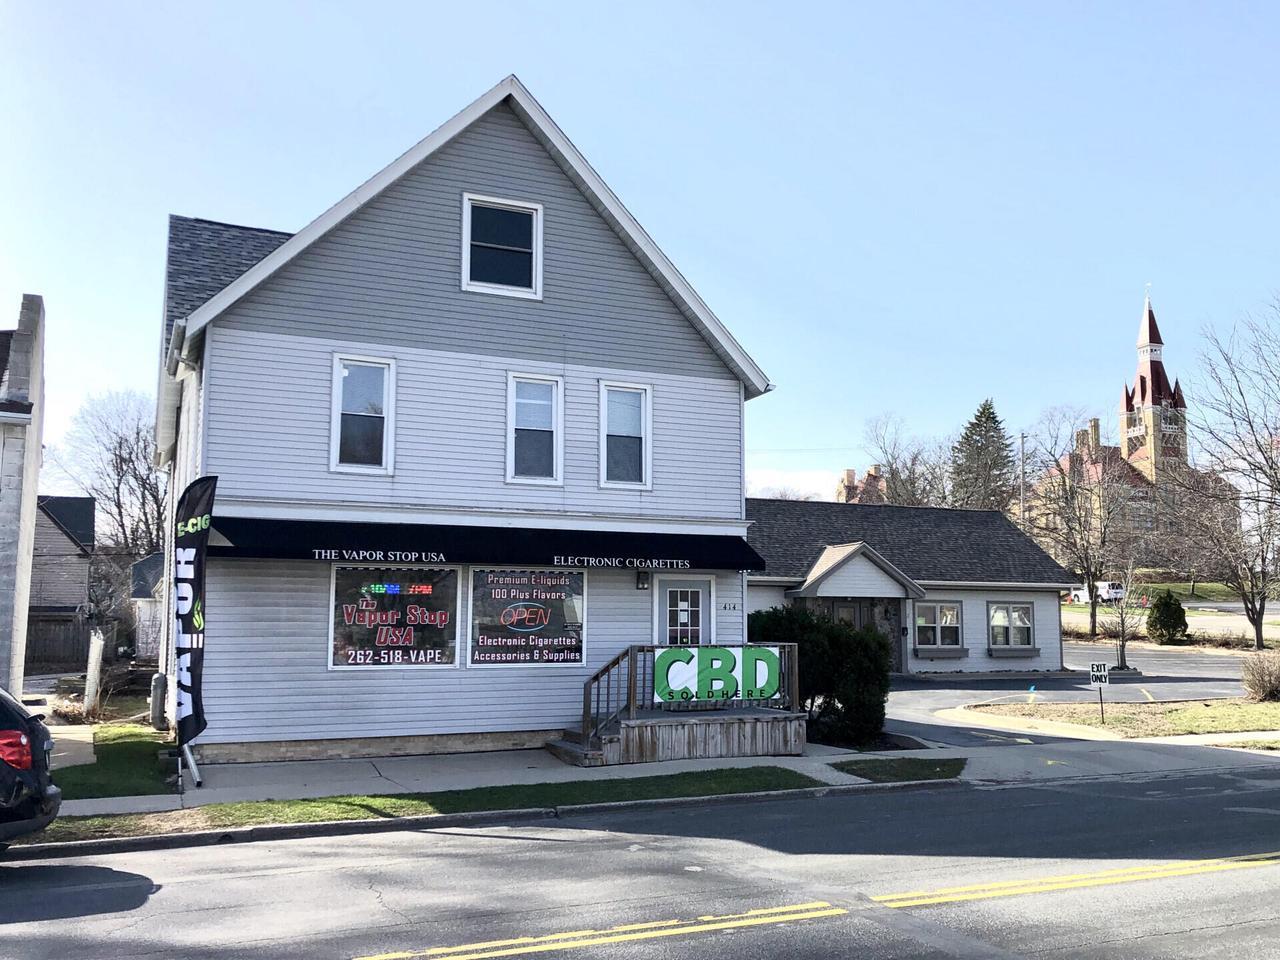 414 S Main St STREET, WEST BEND, WI 53095